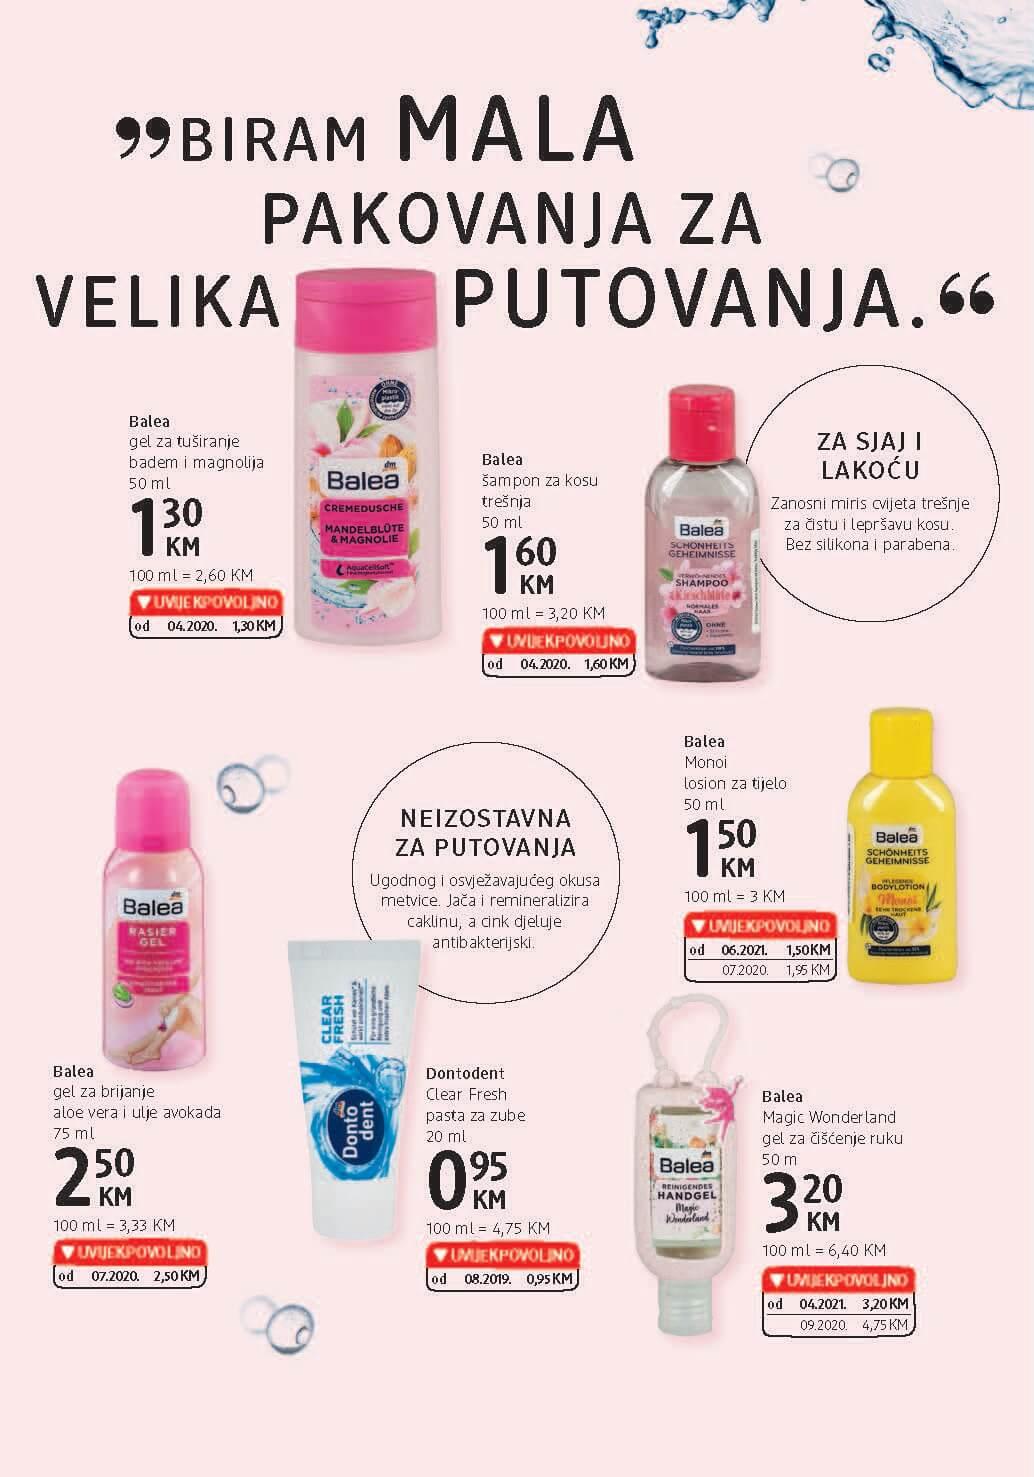 DM Katalog BiH JUN 2021 09.06. 22.06. eKatalozi.com PR Page 08